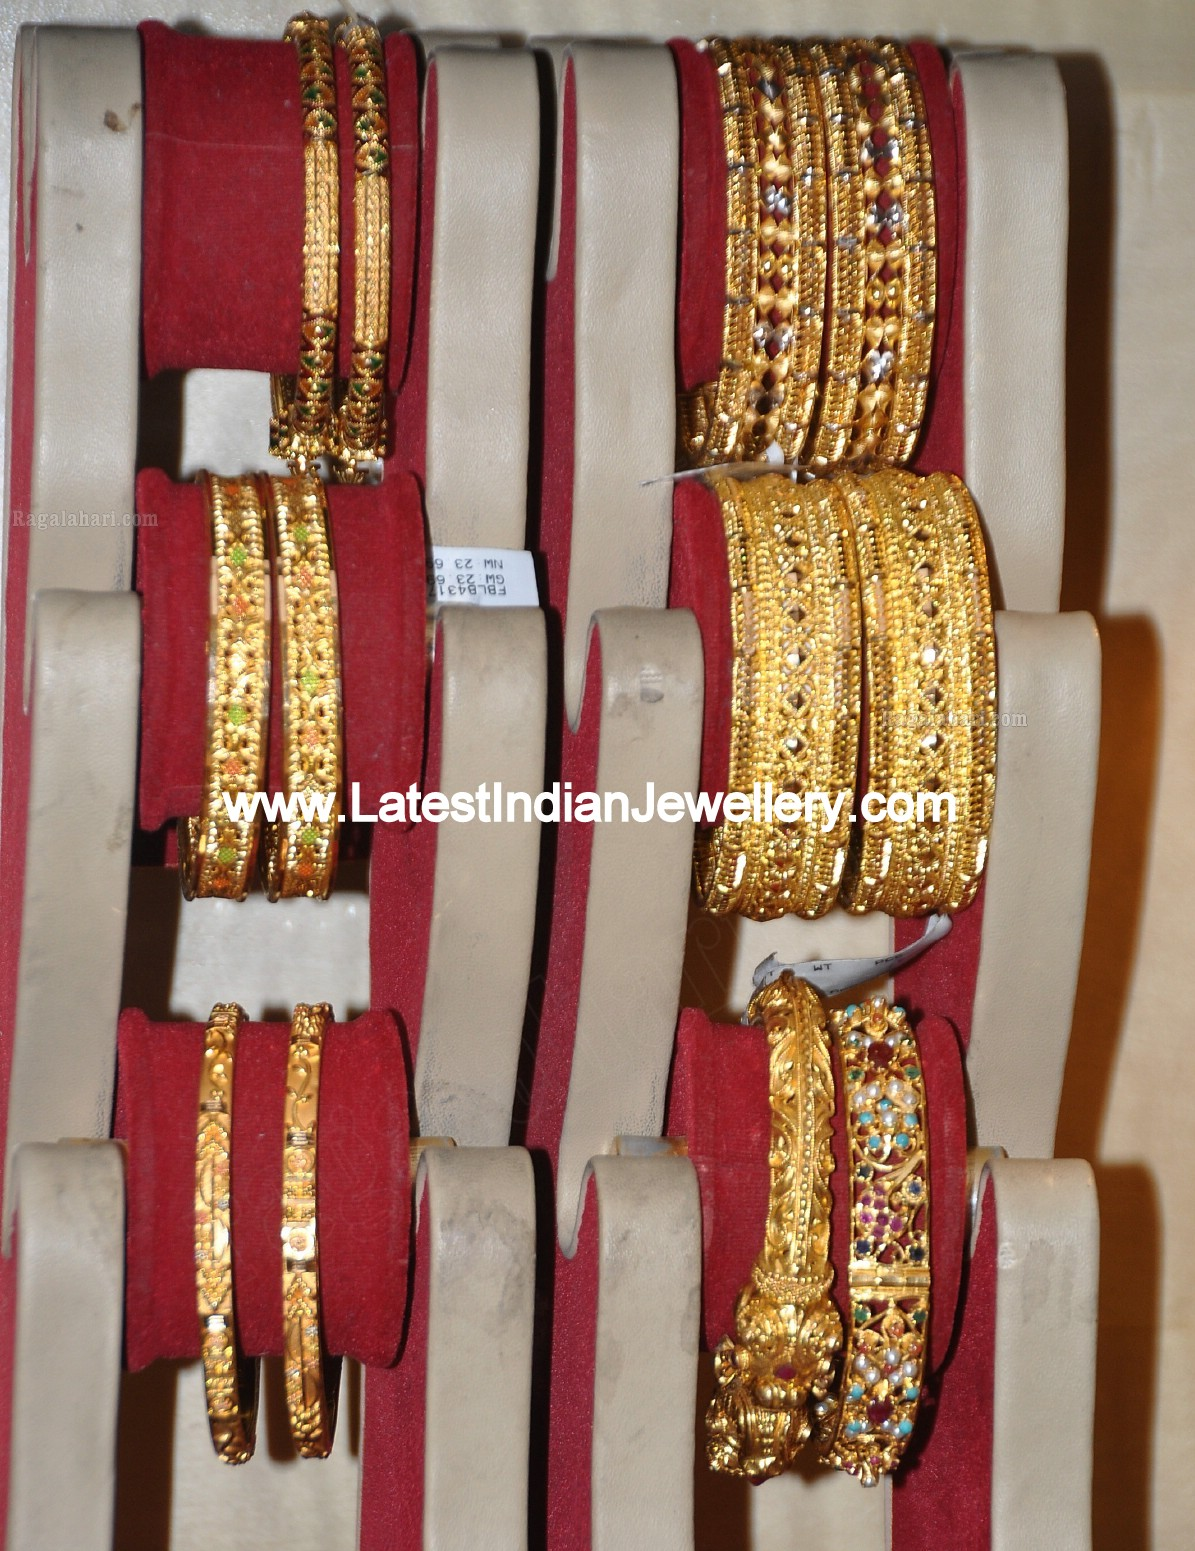 Designer Gold Kadas And Bangles Gallery From Mohammed Khan